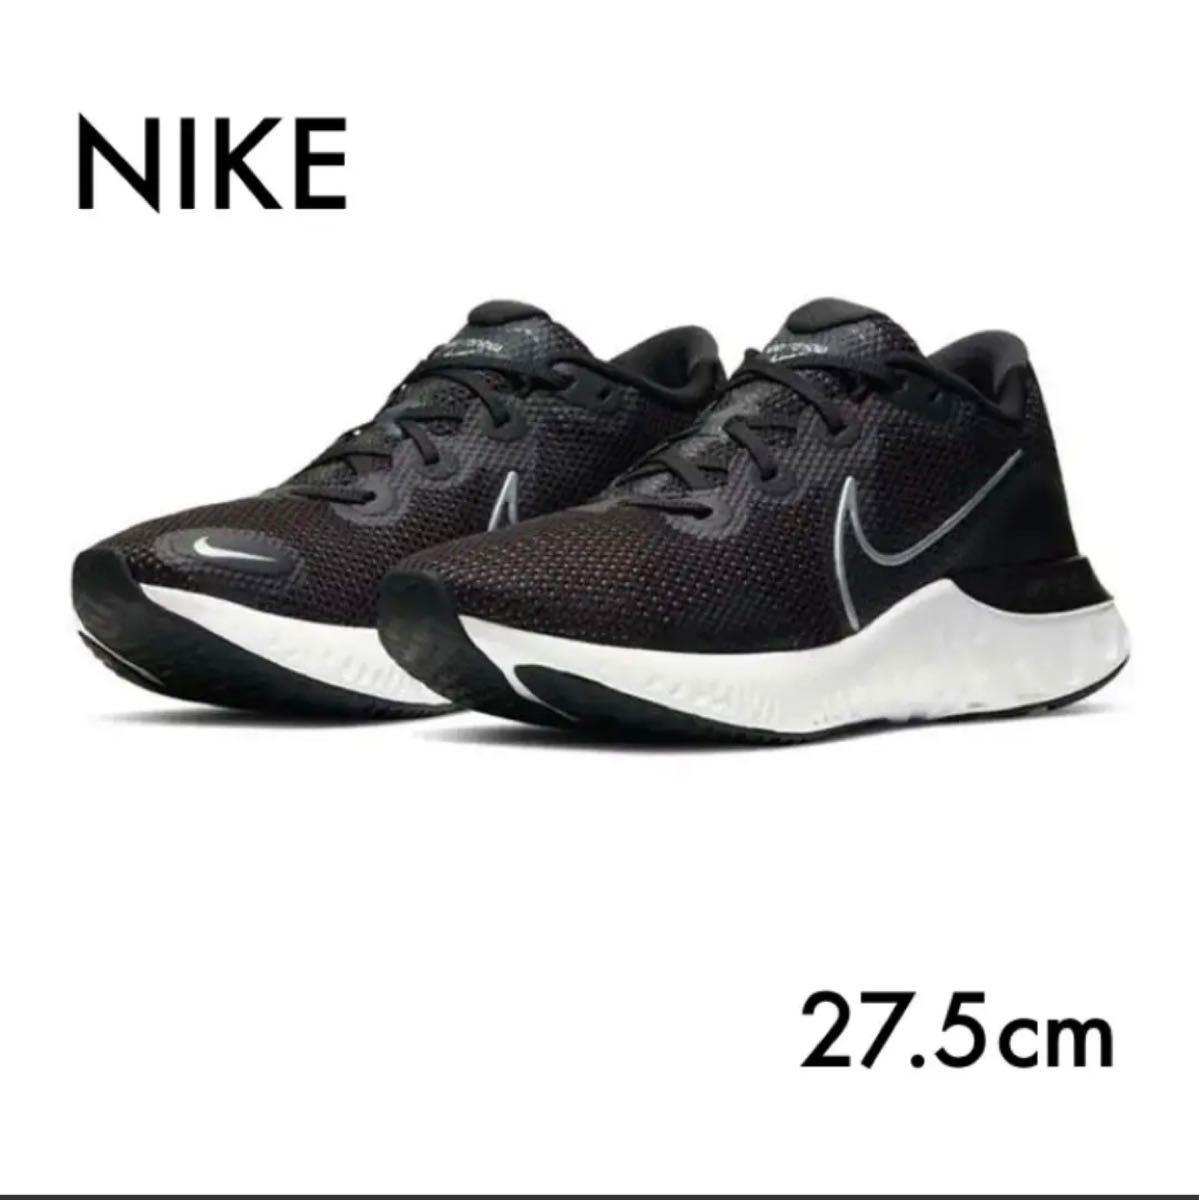 NIKE ランニングシューズ 27.5cm